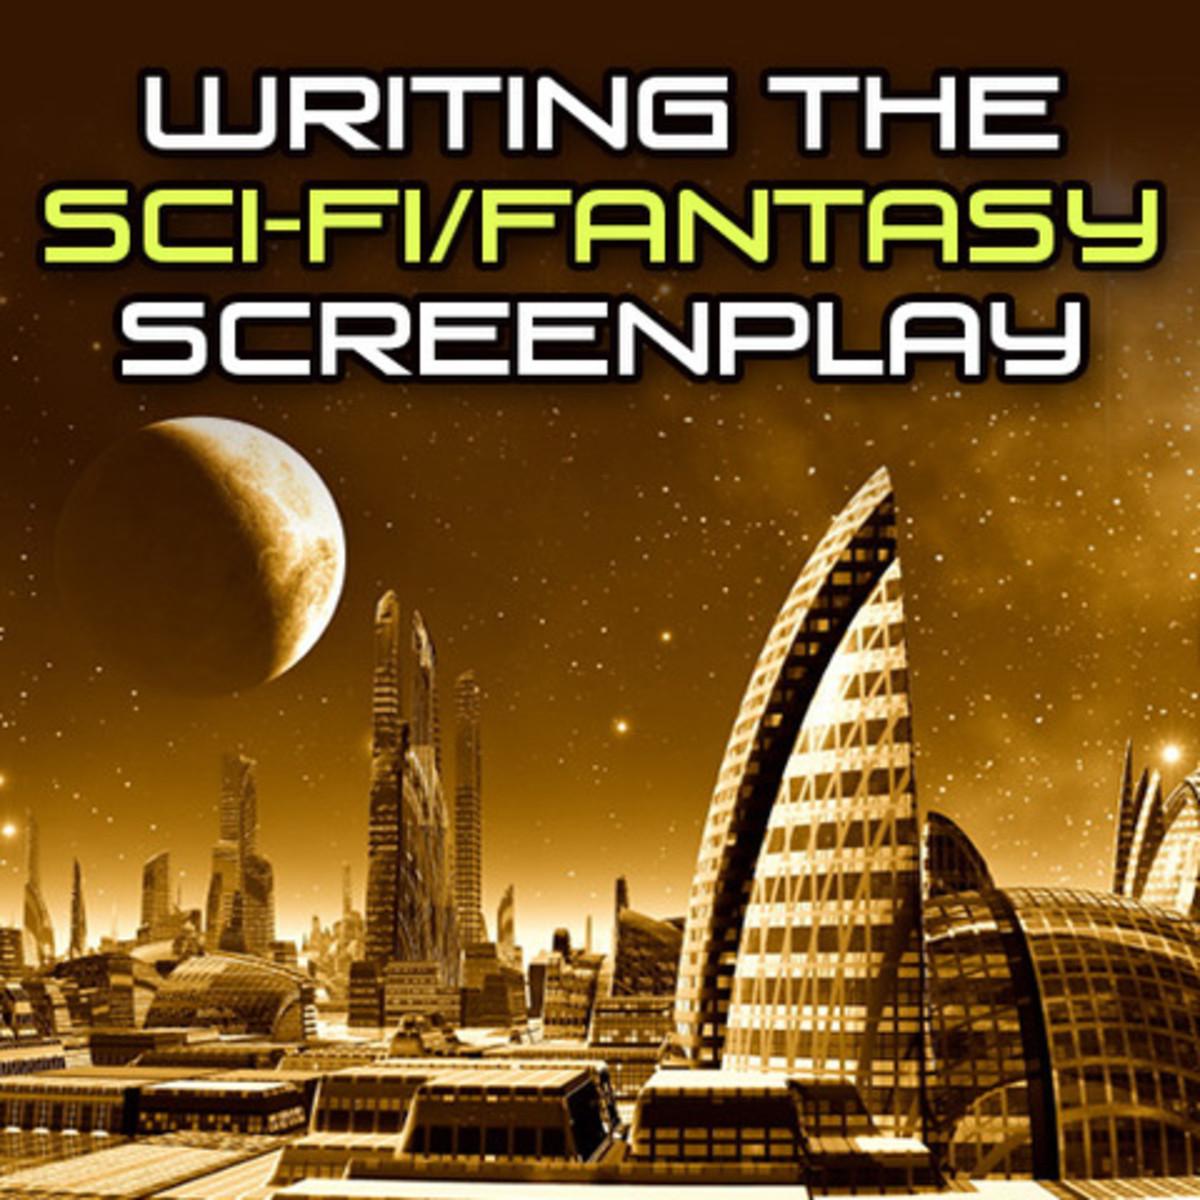 ws sci-fi fantasy screenplay